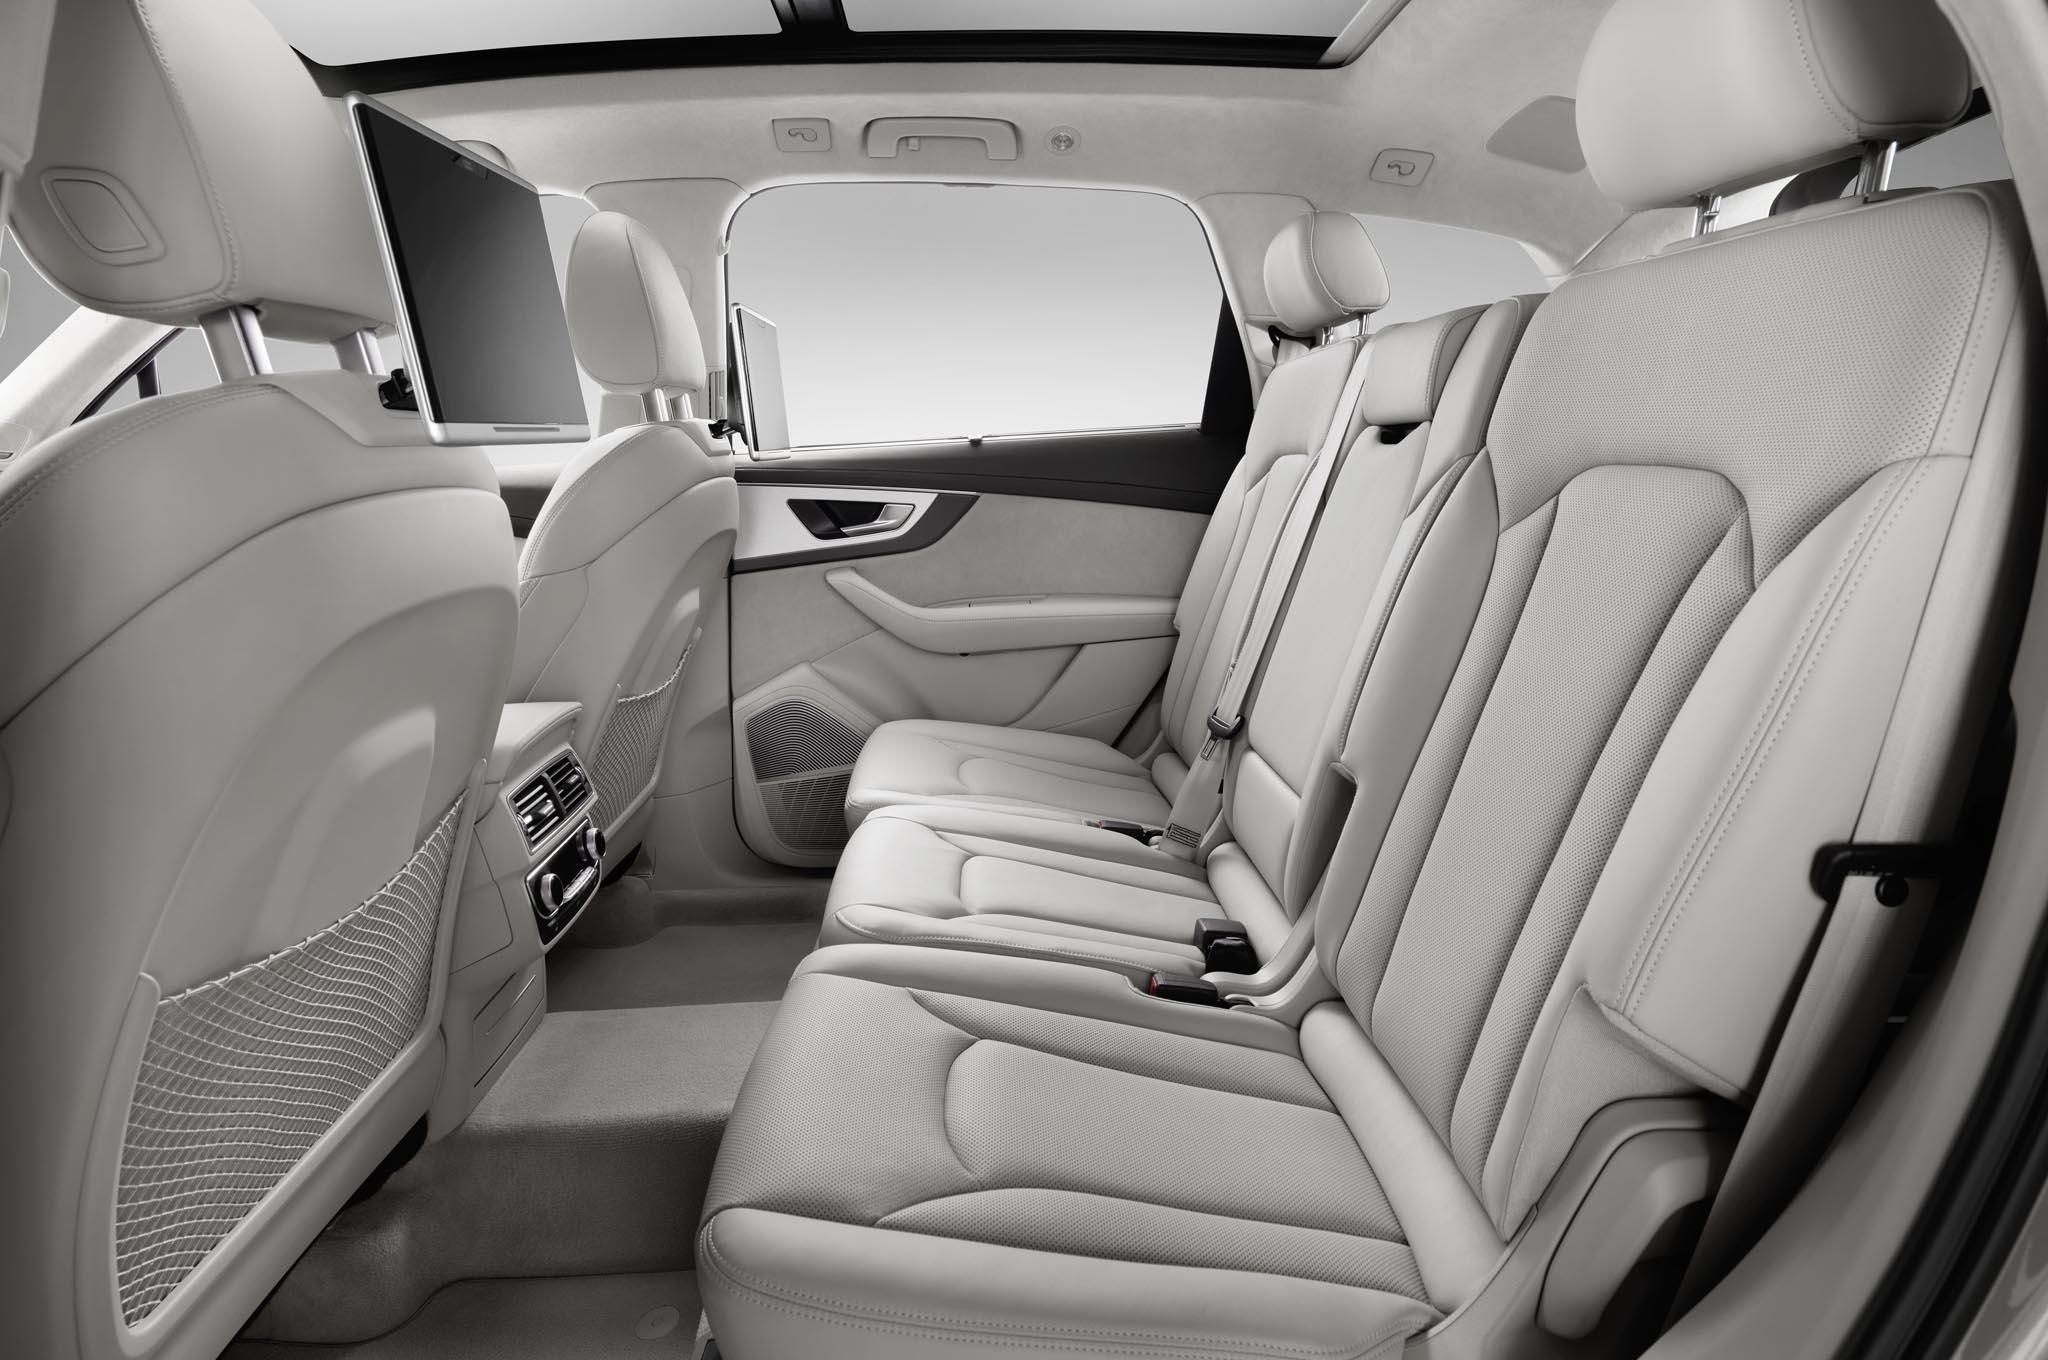 Audi Q (View 3 of 8)